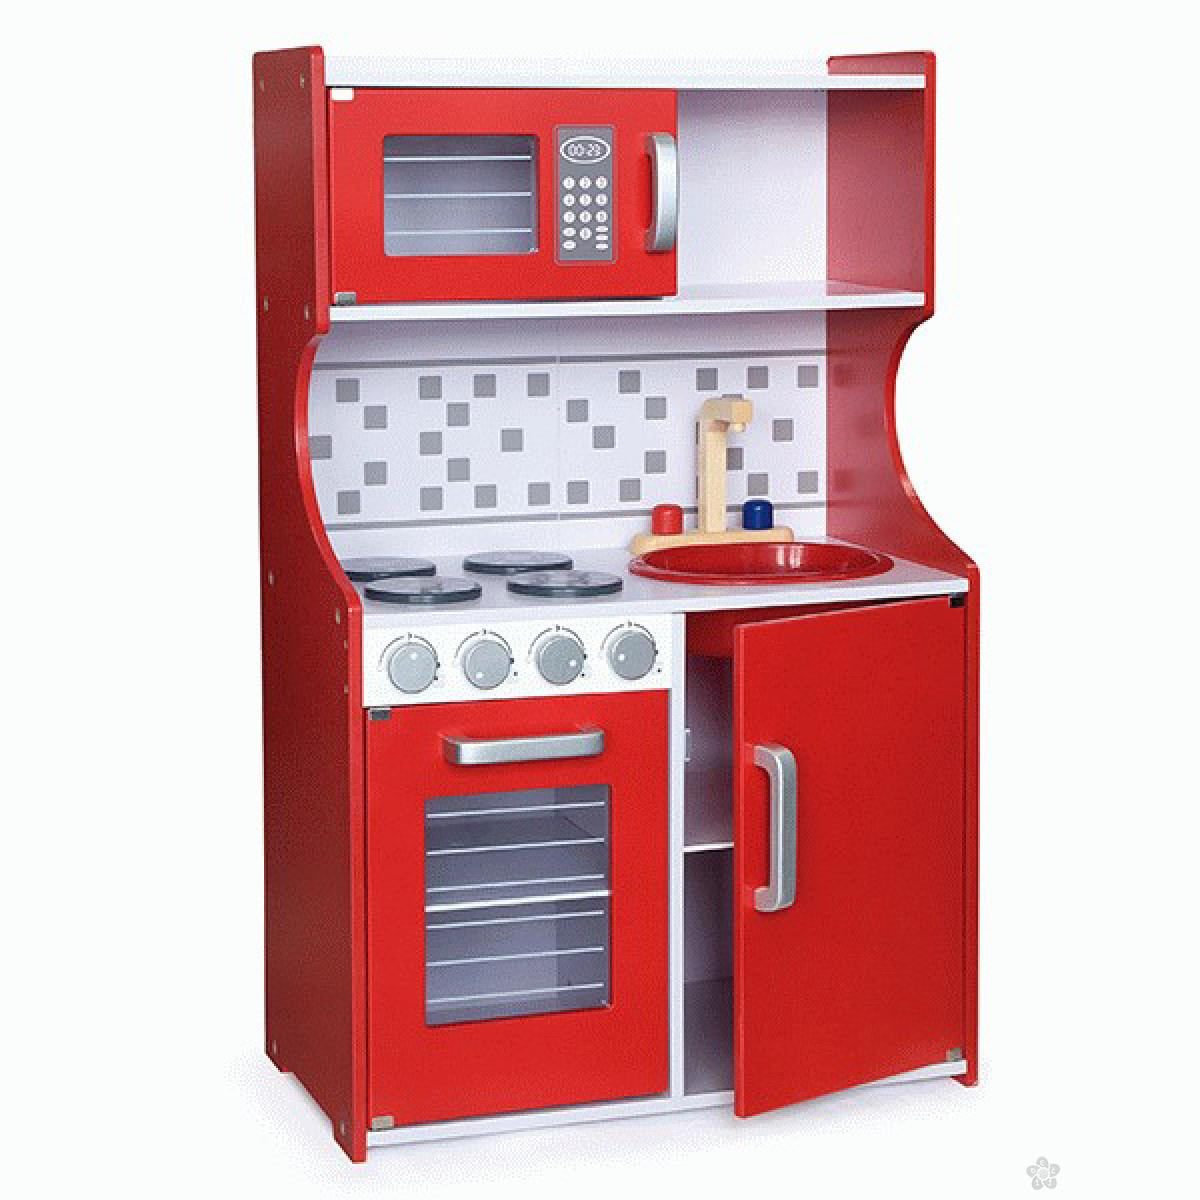 Drvena kuhinja Modern Red Viga, 50379